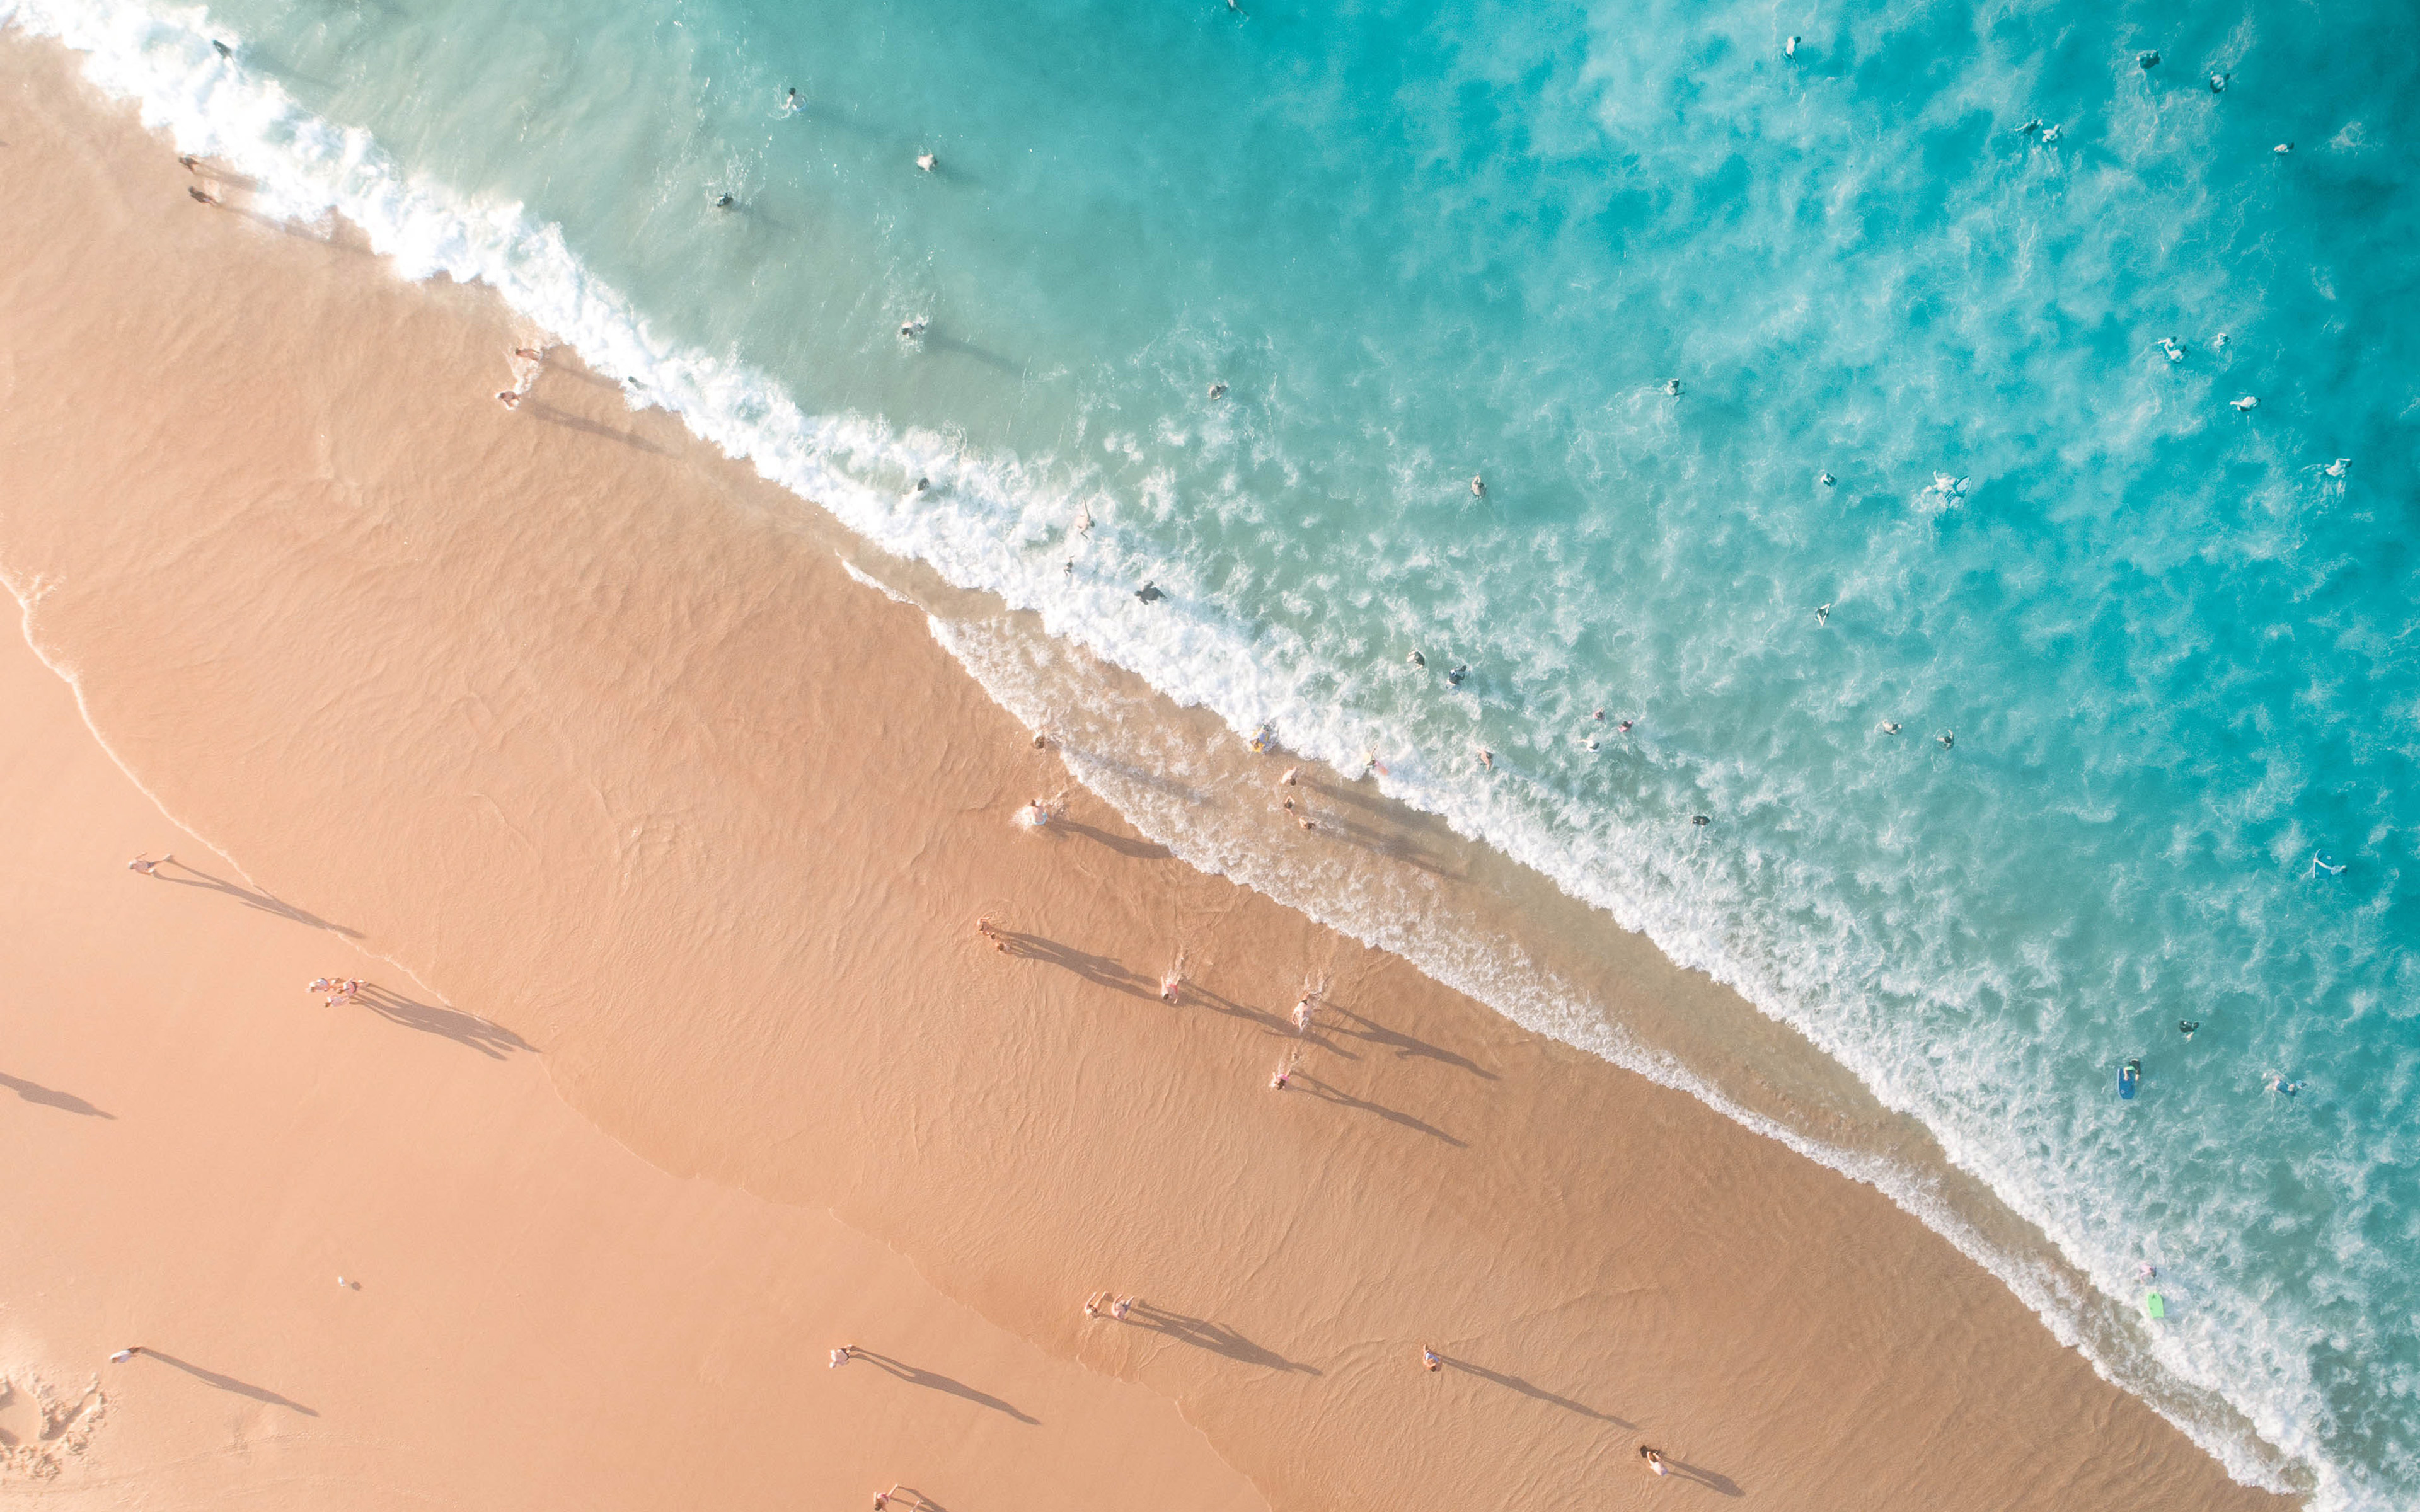 Oc67 Sea Vacation Beach Ocean Summer Nature Wallpaper